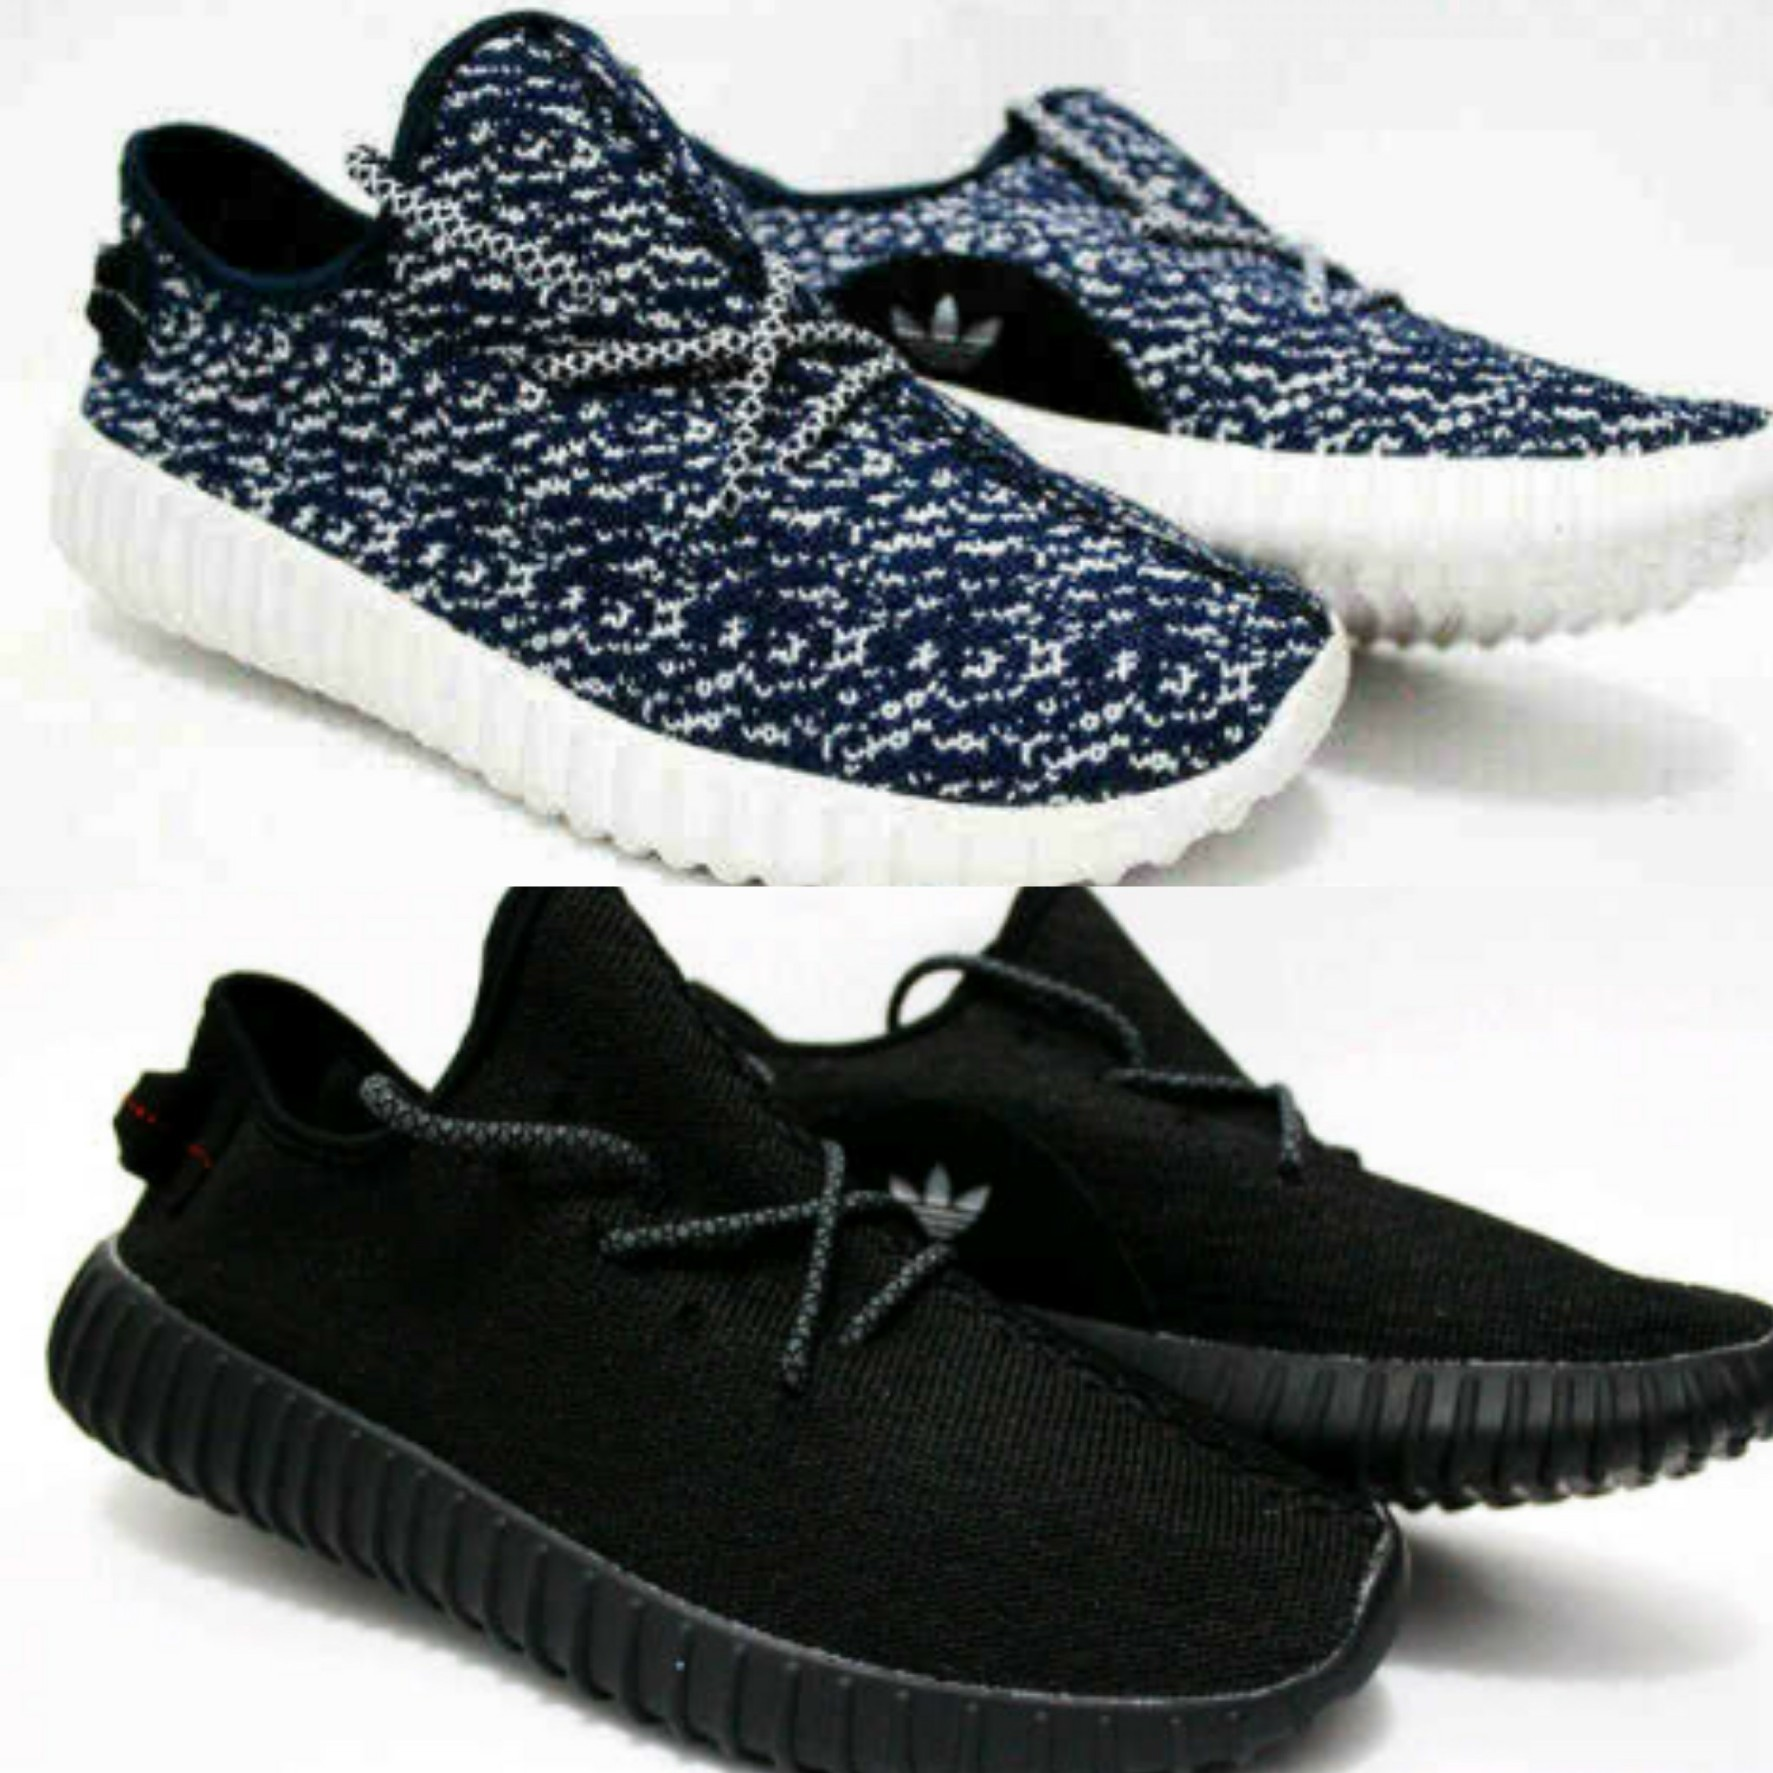 Jual Sepatu Adidas Gazelle Sepatu Adidas Original Sepatu Adidas